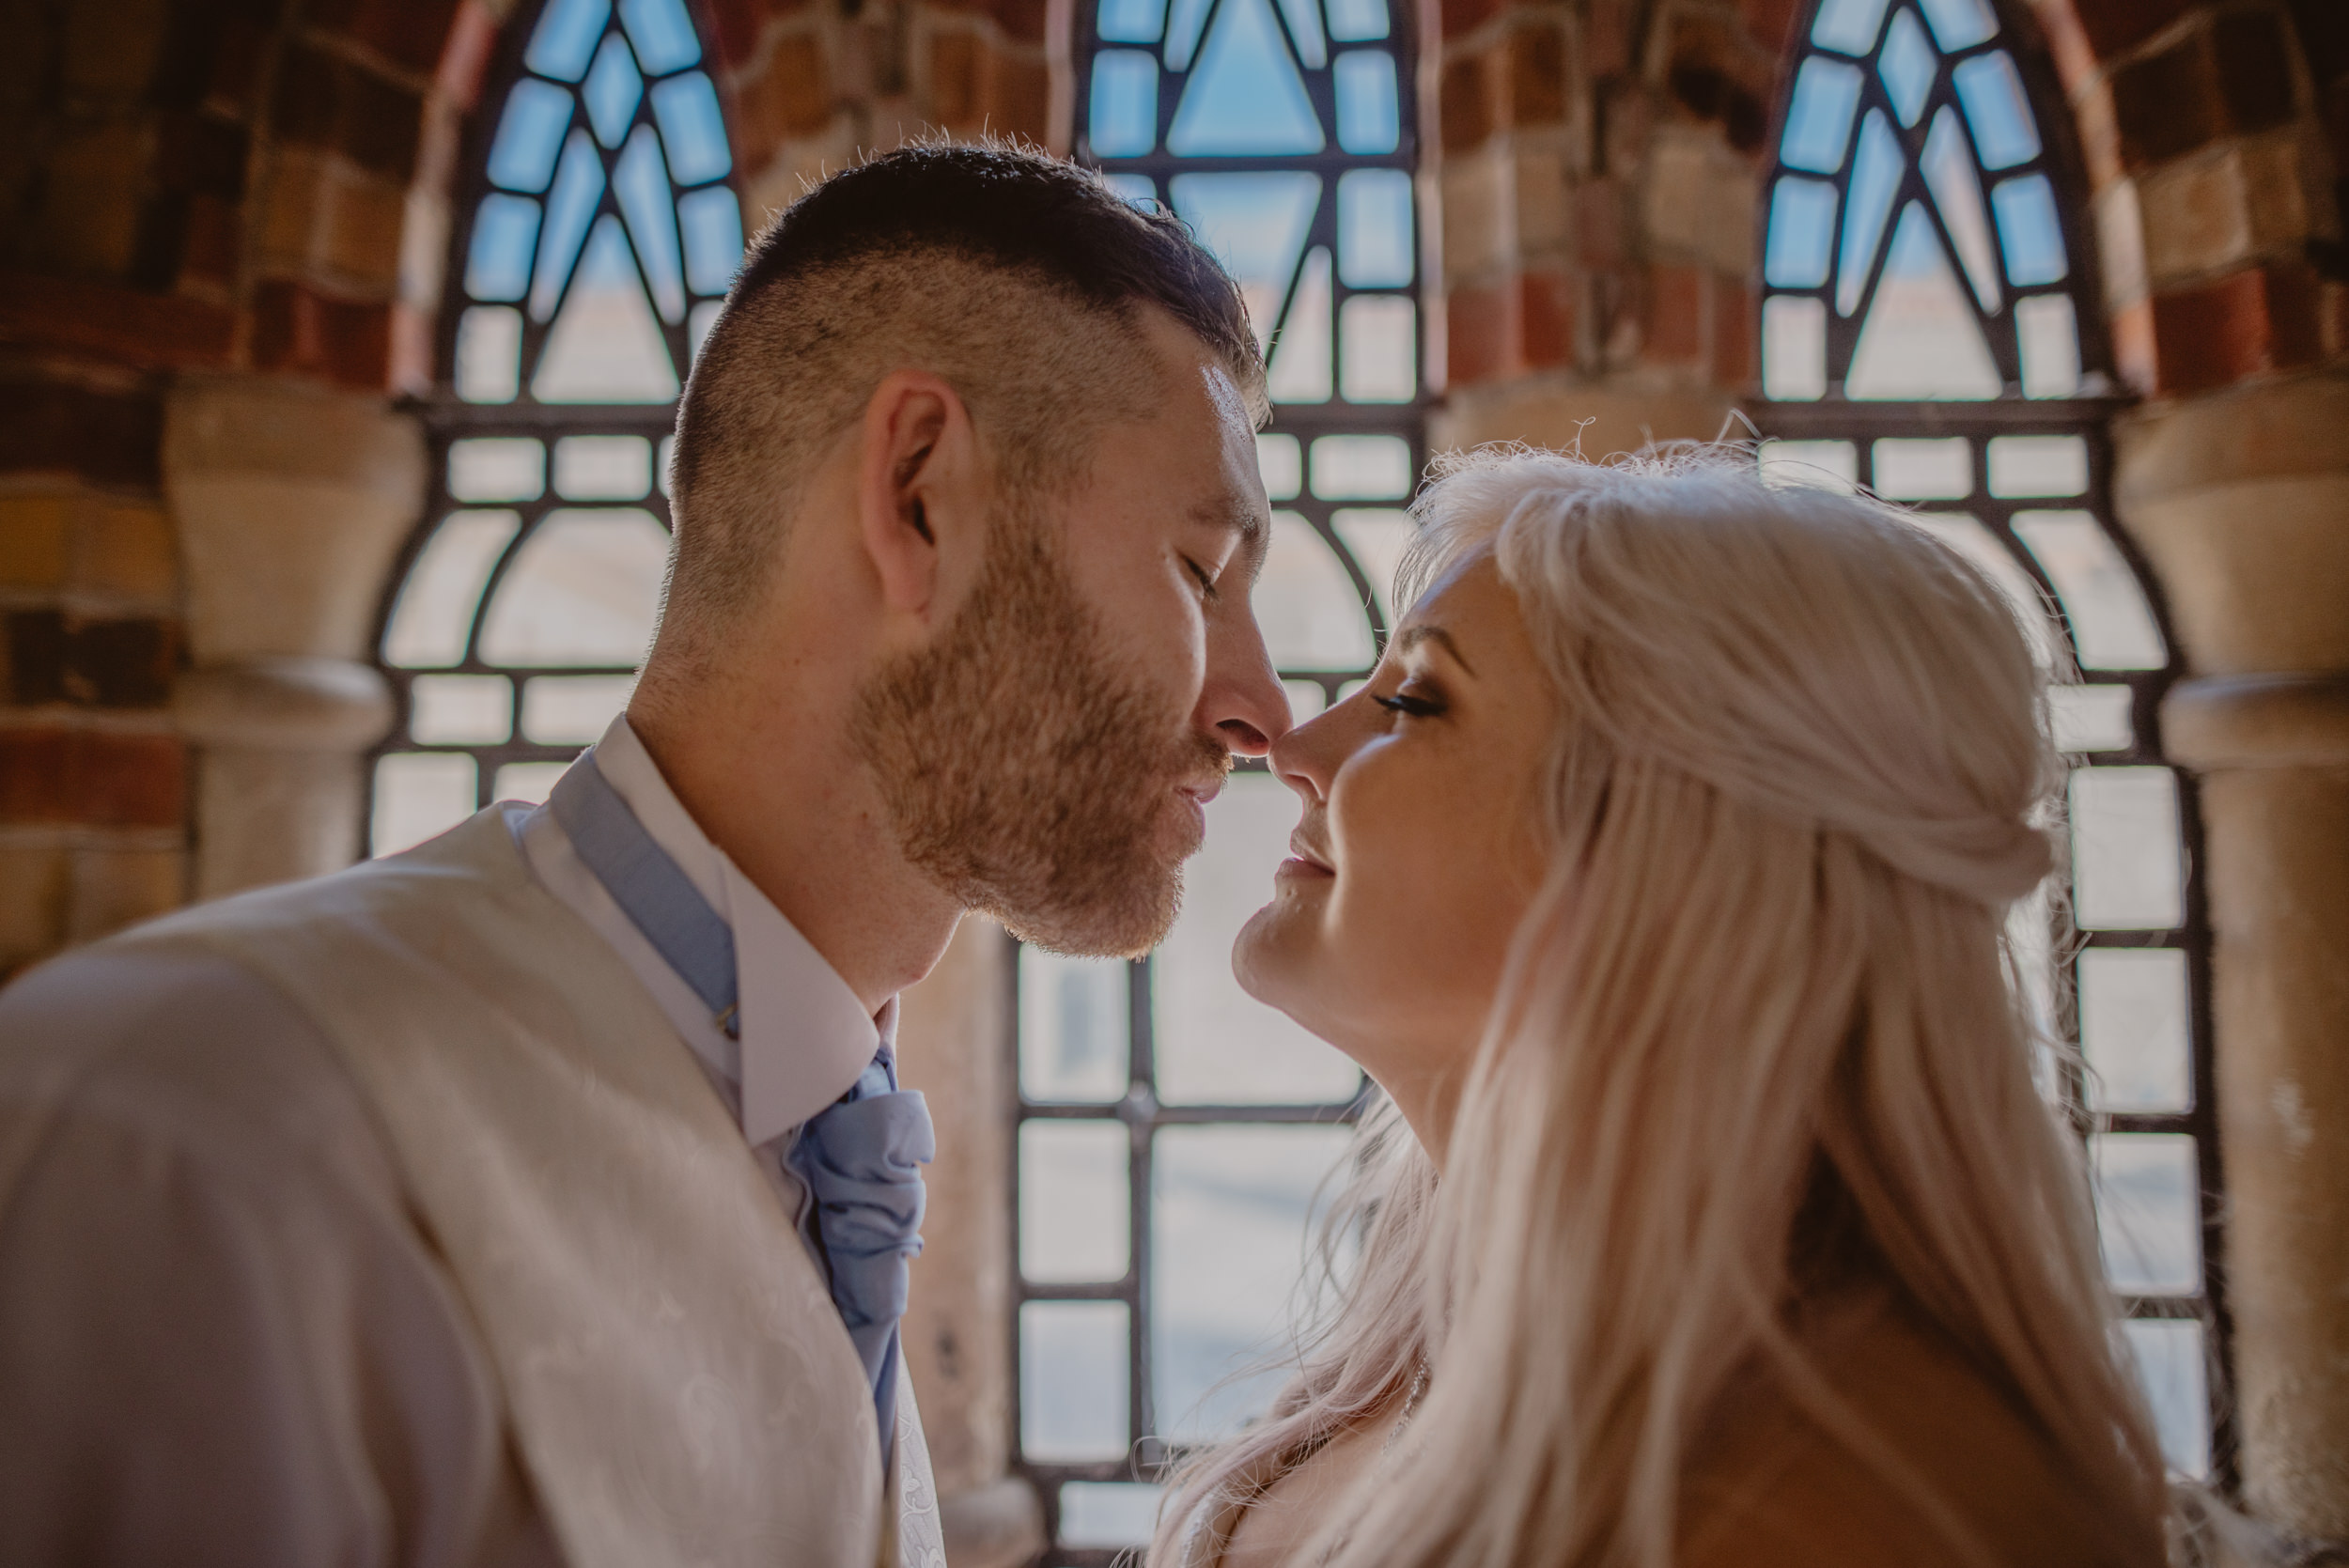 Rachel-and-James-Wedding-Horsley-Towers-State-Manu-Mendoza-Wedding-Photography-478.jpg